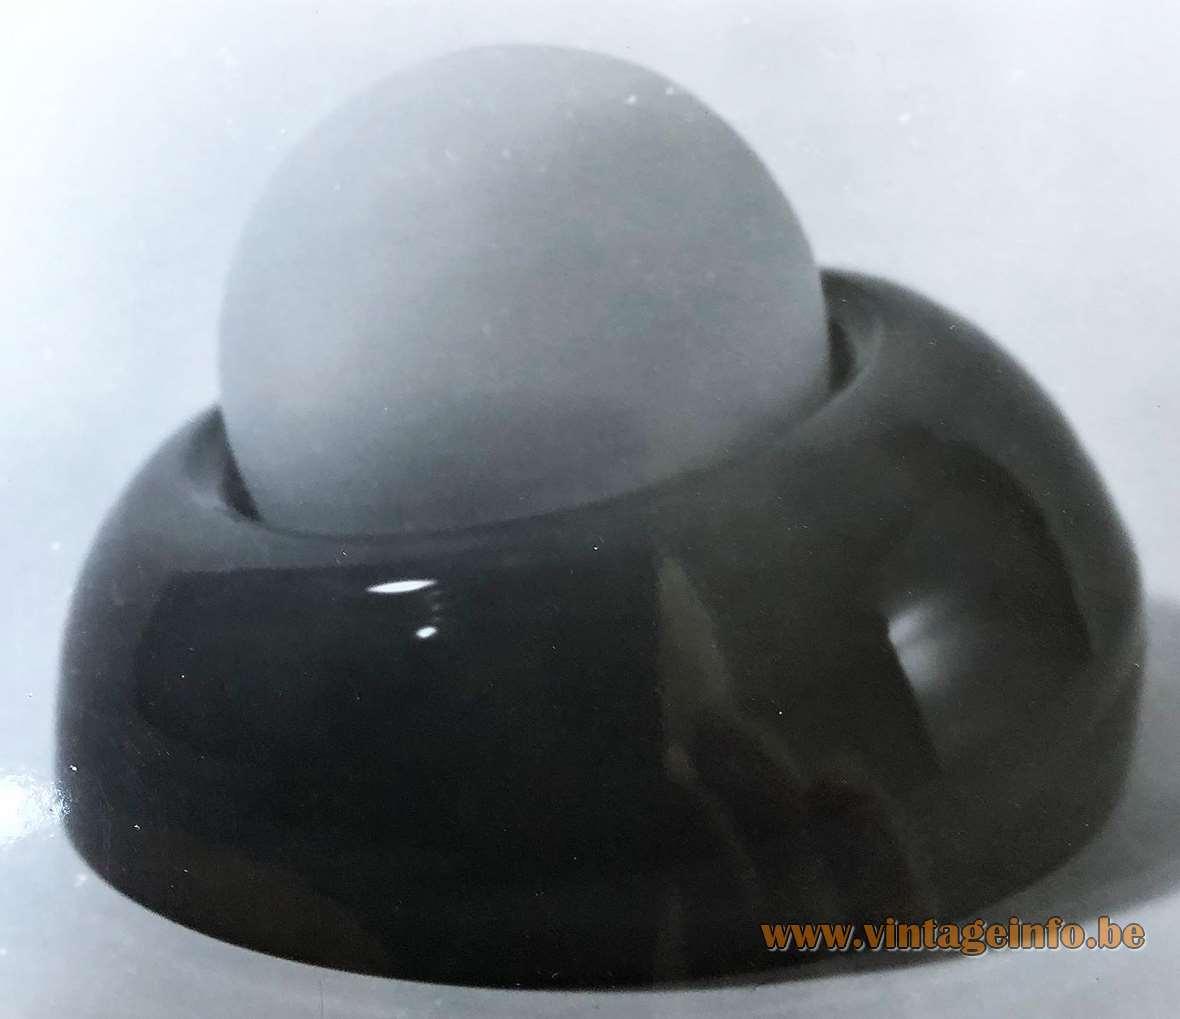 Herwig & Frank Sterckx round table lamp designed for De Rupel Glass, Boom - Expo 1970